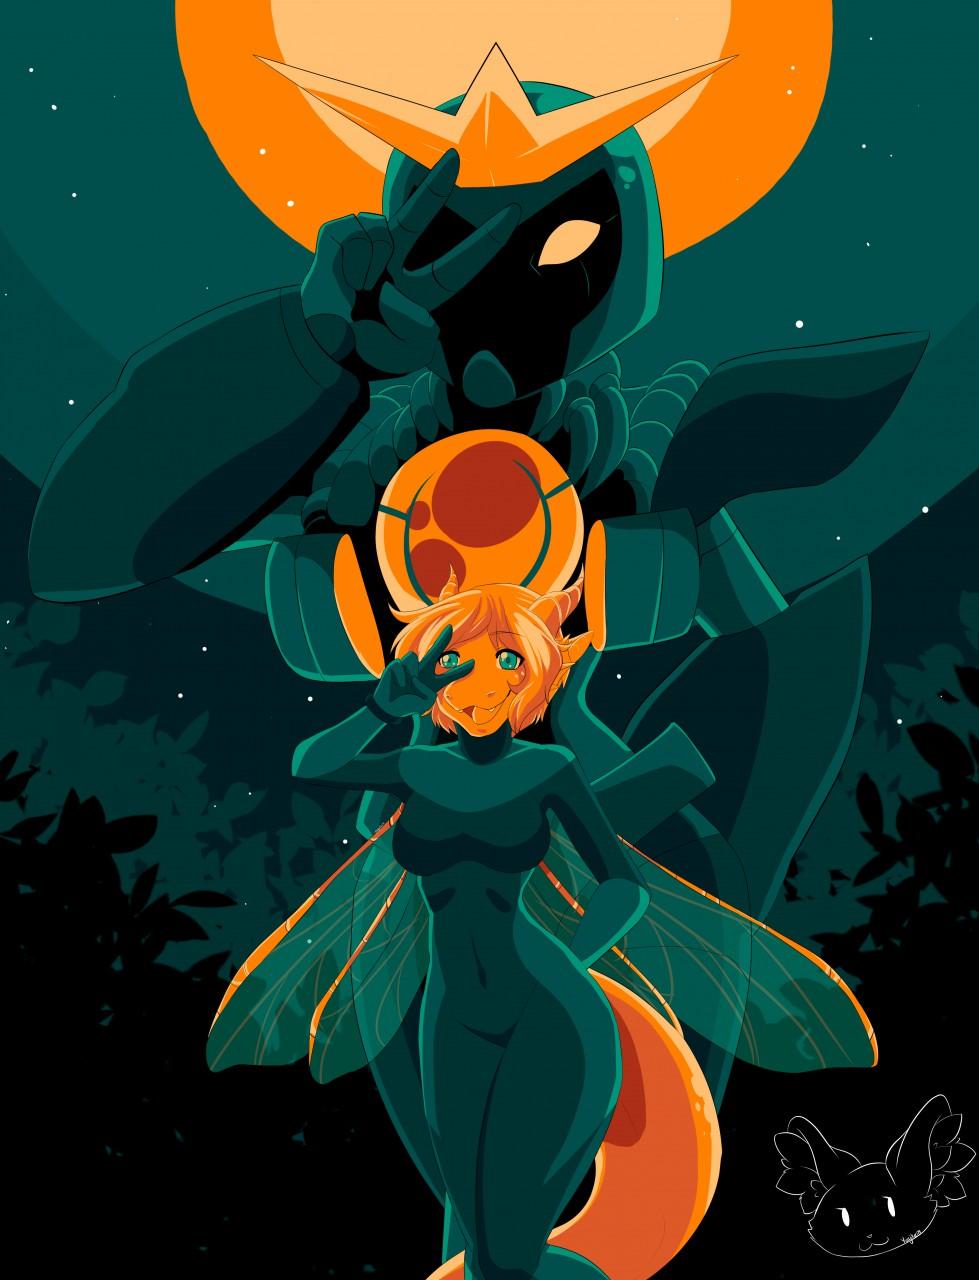 Most recent image: [ShadowRaiser] GreenOrange